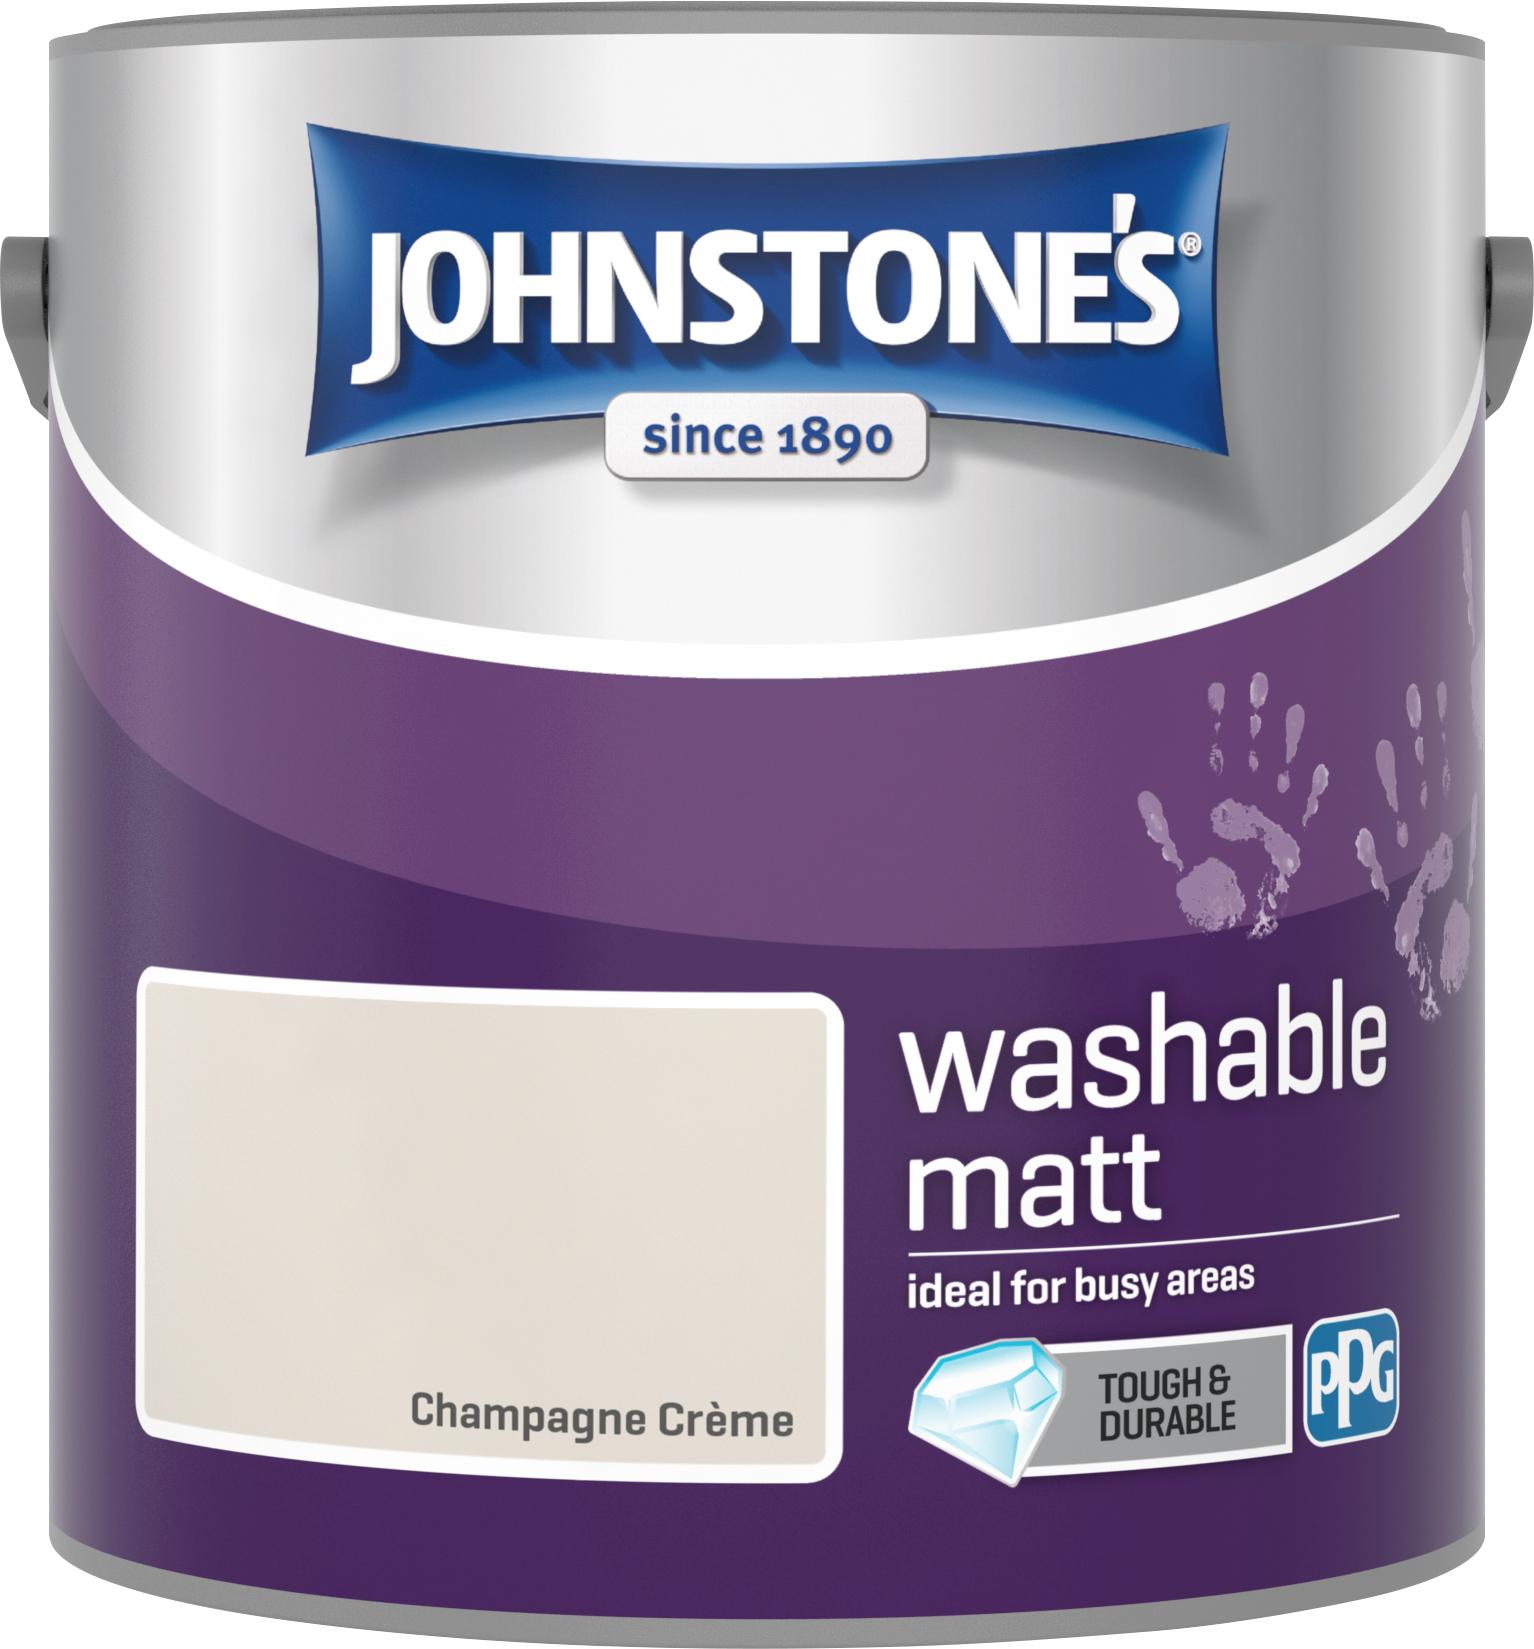 Johnstone's 2.5 Litre Washable Matt Emulsion Paint -  Champagne Creme